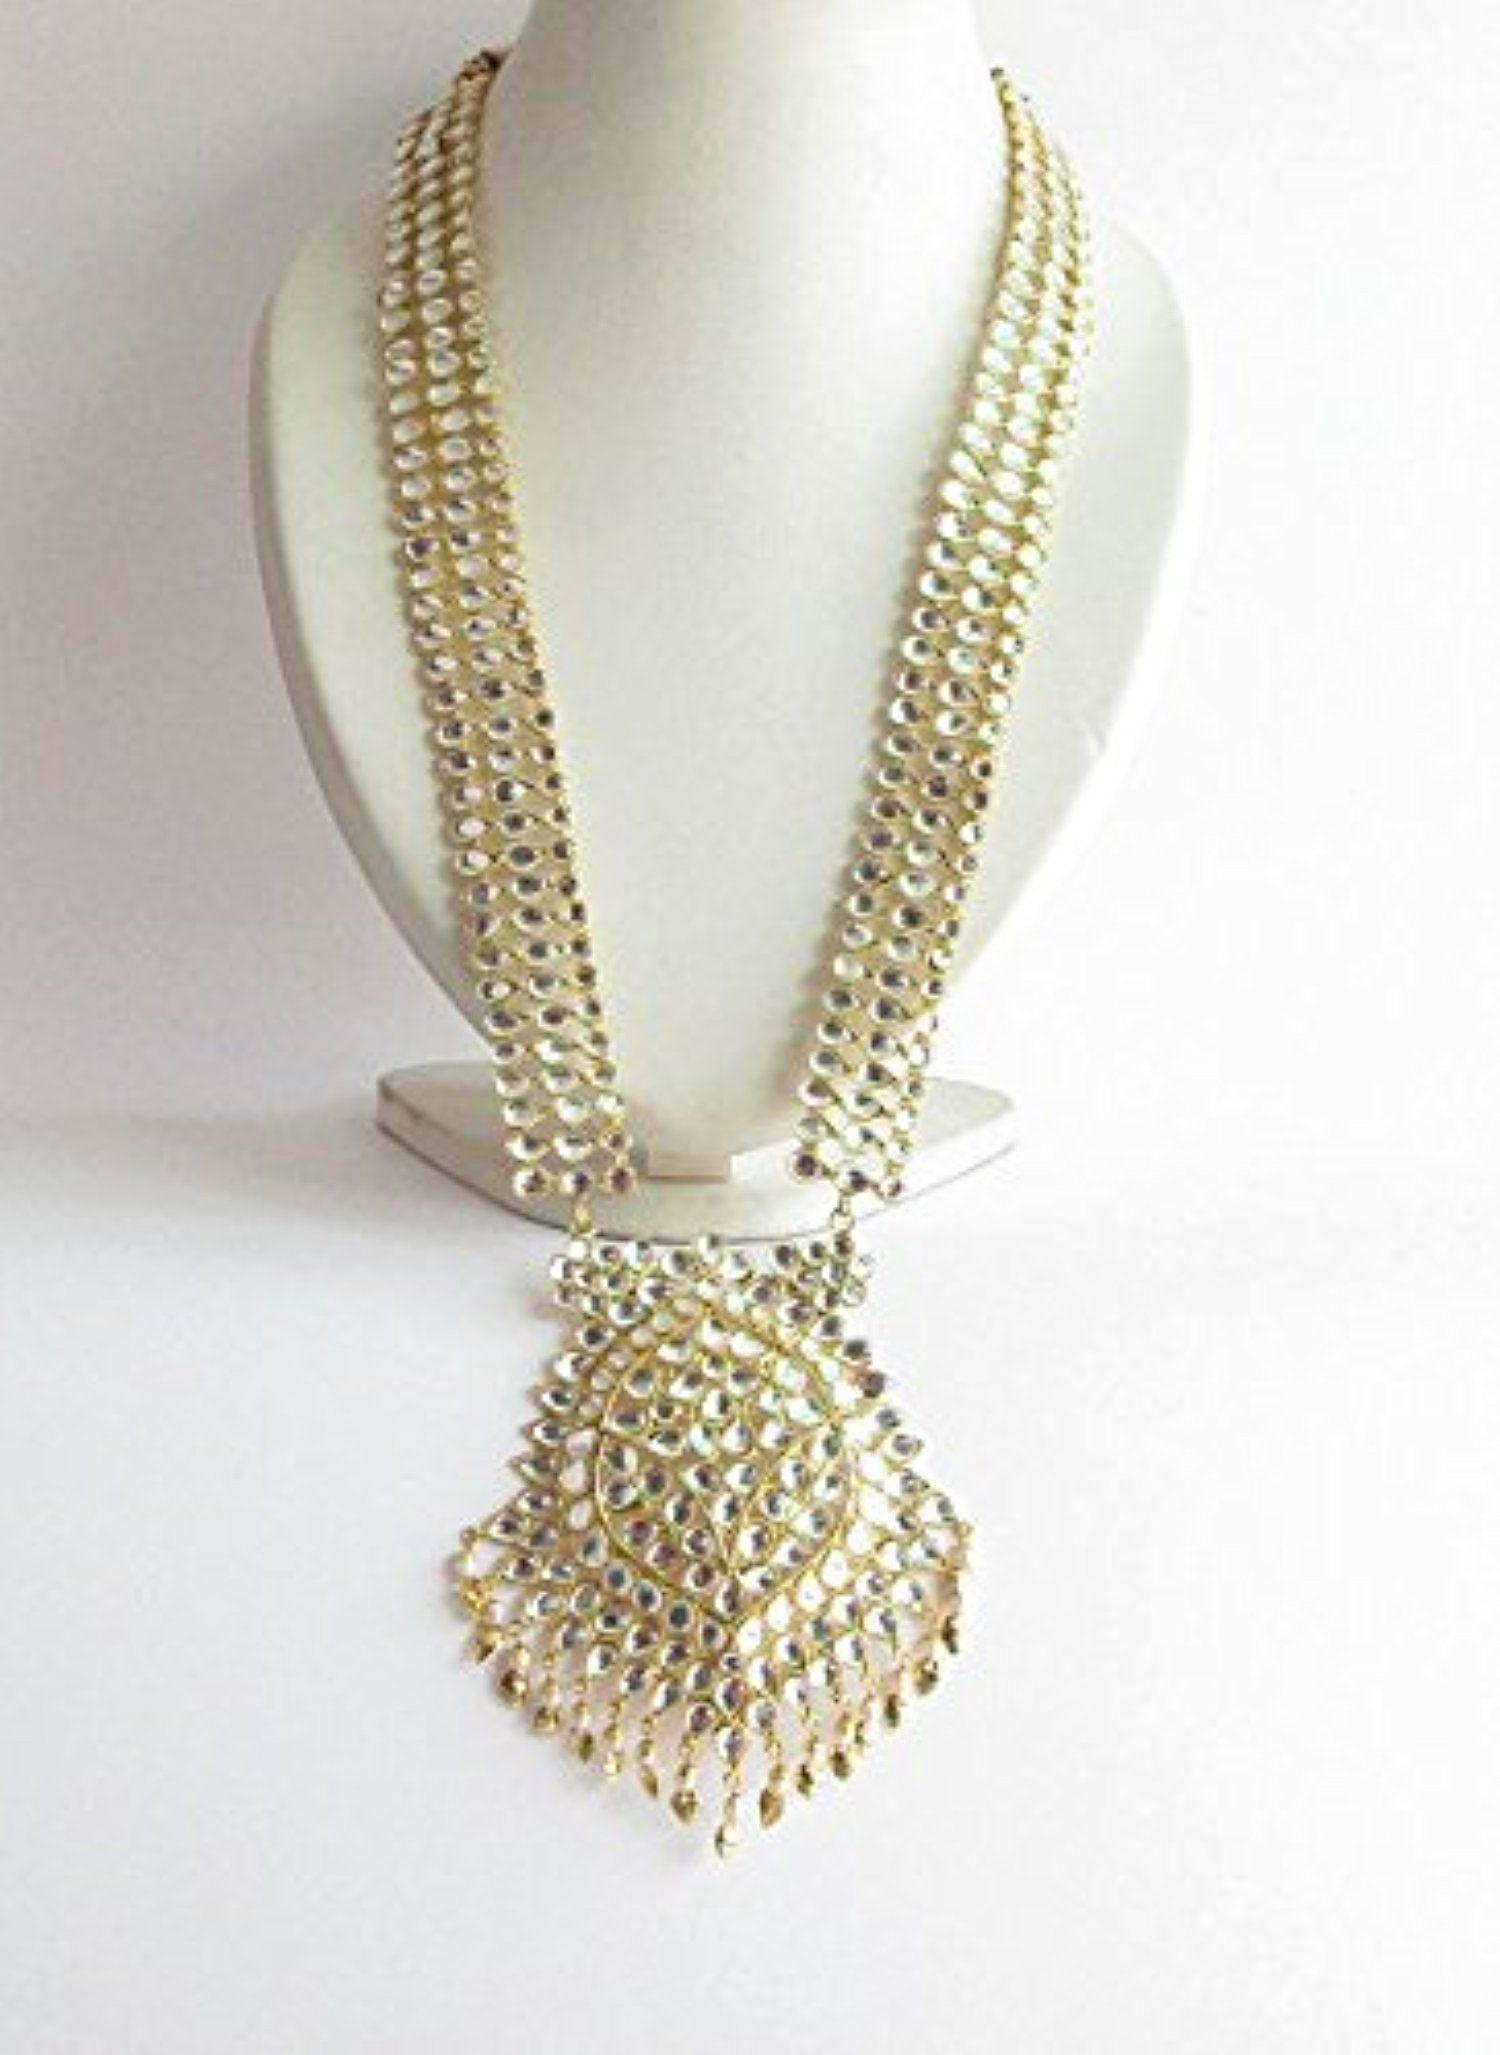 ee988abc8c0 Princess Kundan Rani Haar Necklace Earrings Set Layered Raani Haar Gold  Indian Punjabi Bridal Long Jadau Necklace Jewelry Bridal Pakistani Muslim  Set ...